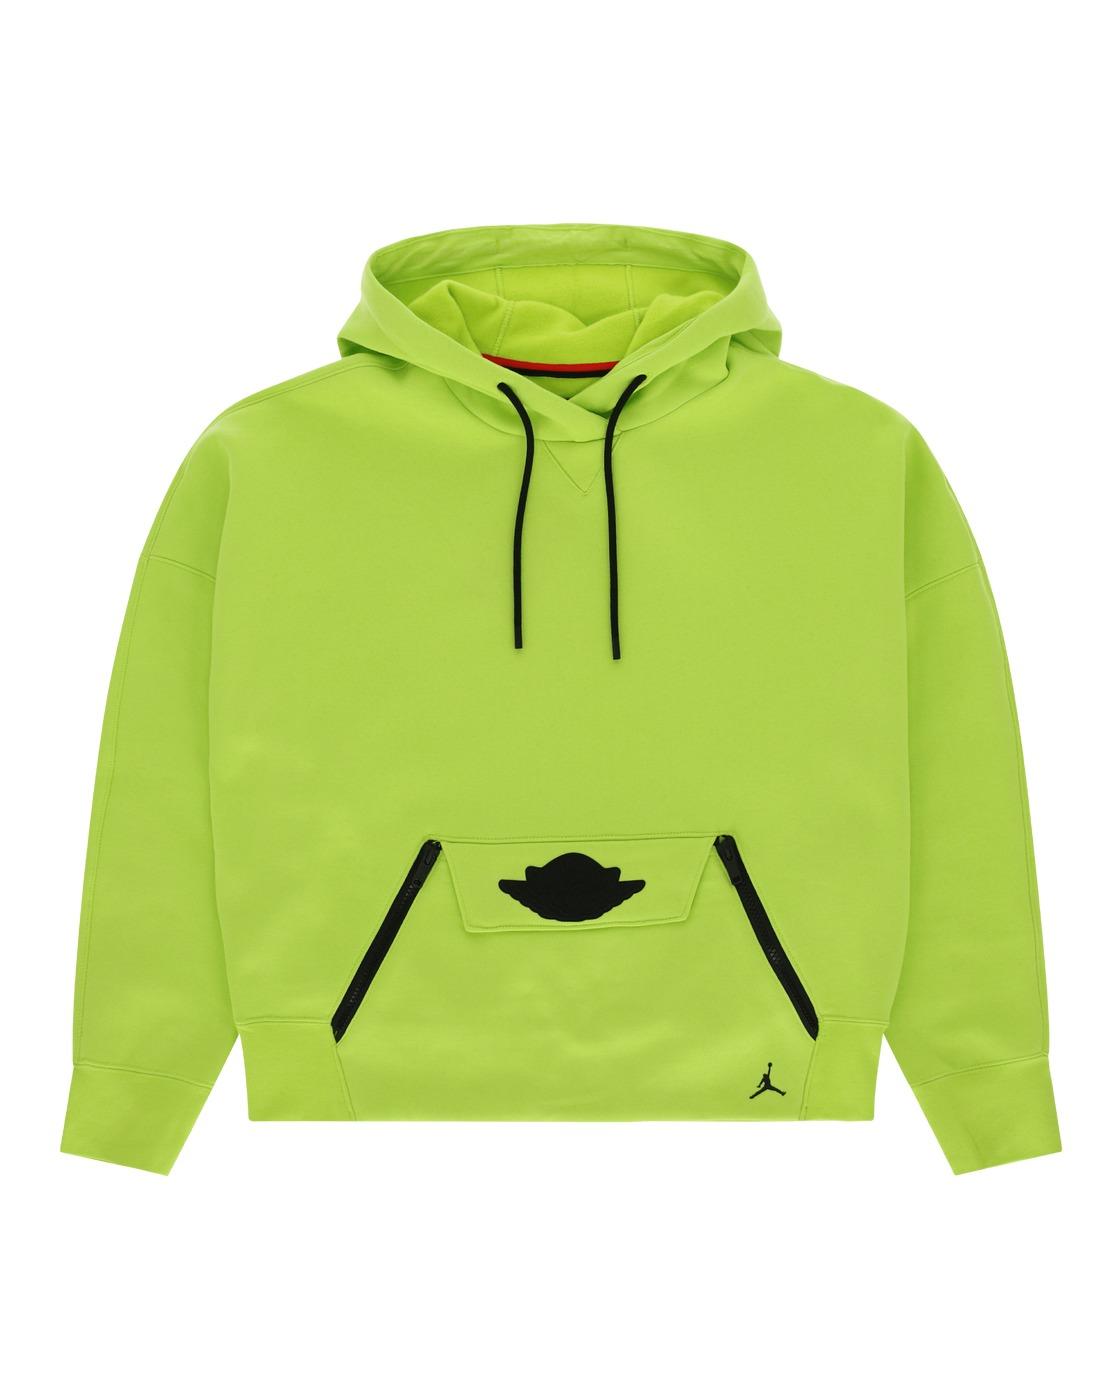 Nike Jordan Fleece Hooded Sweatshirt Cyber/Black